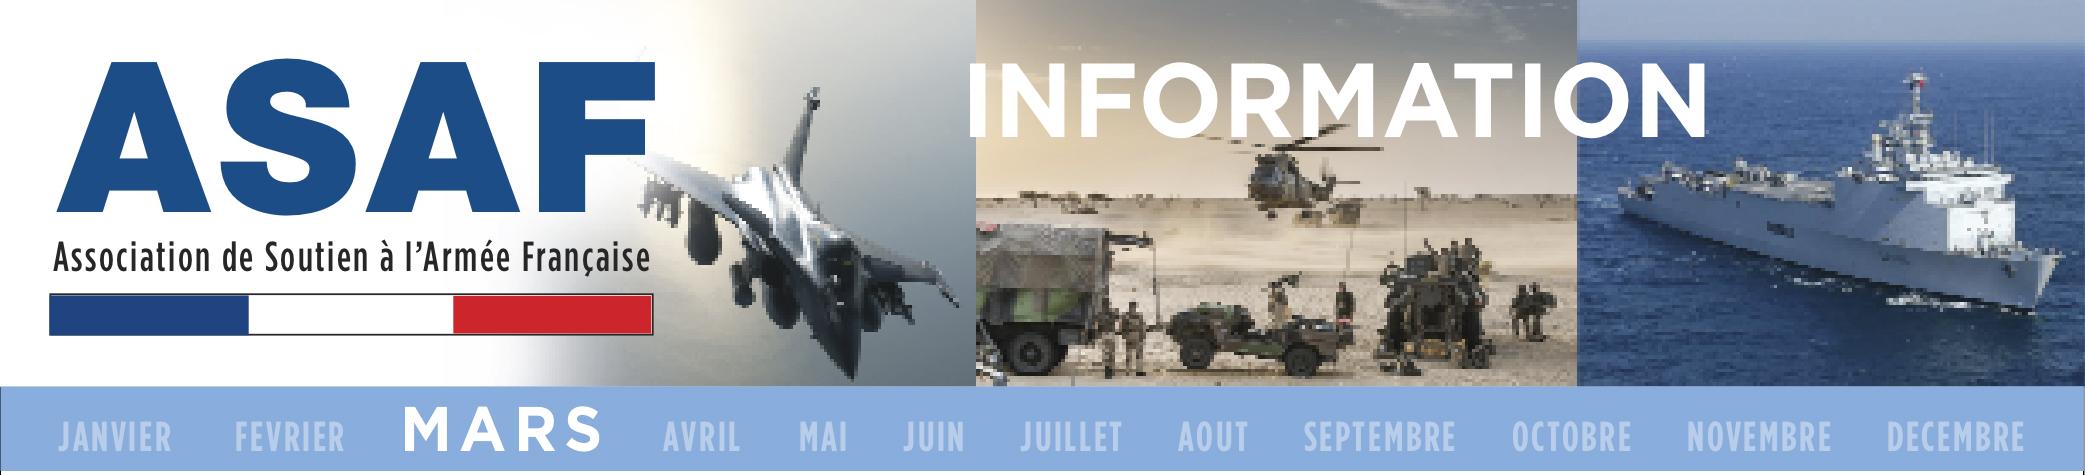 ASAF: Lettre d'information - MARS 2018 Information_Mars